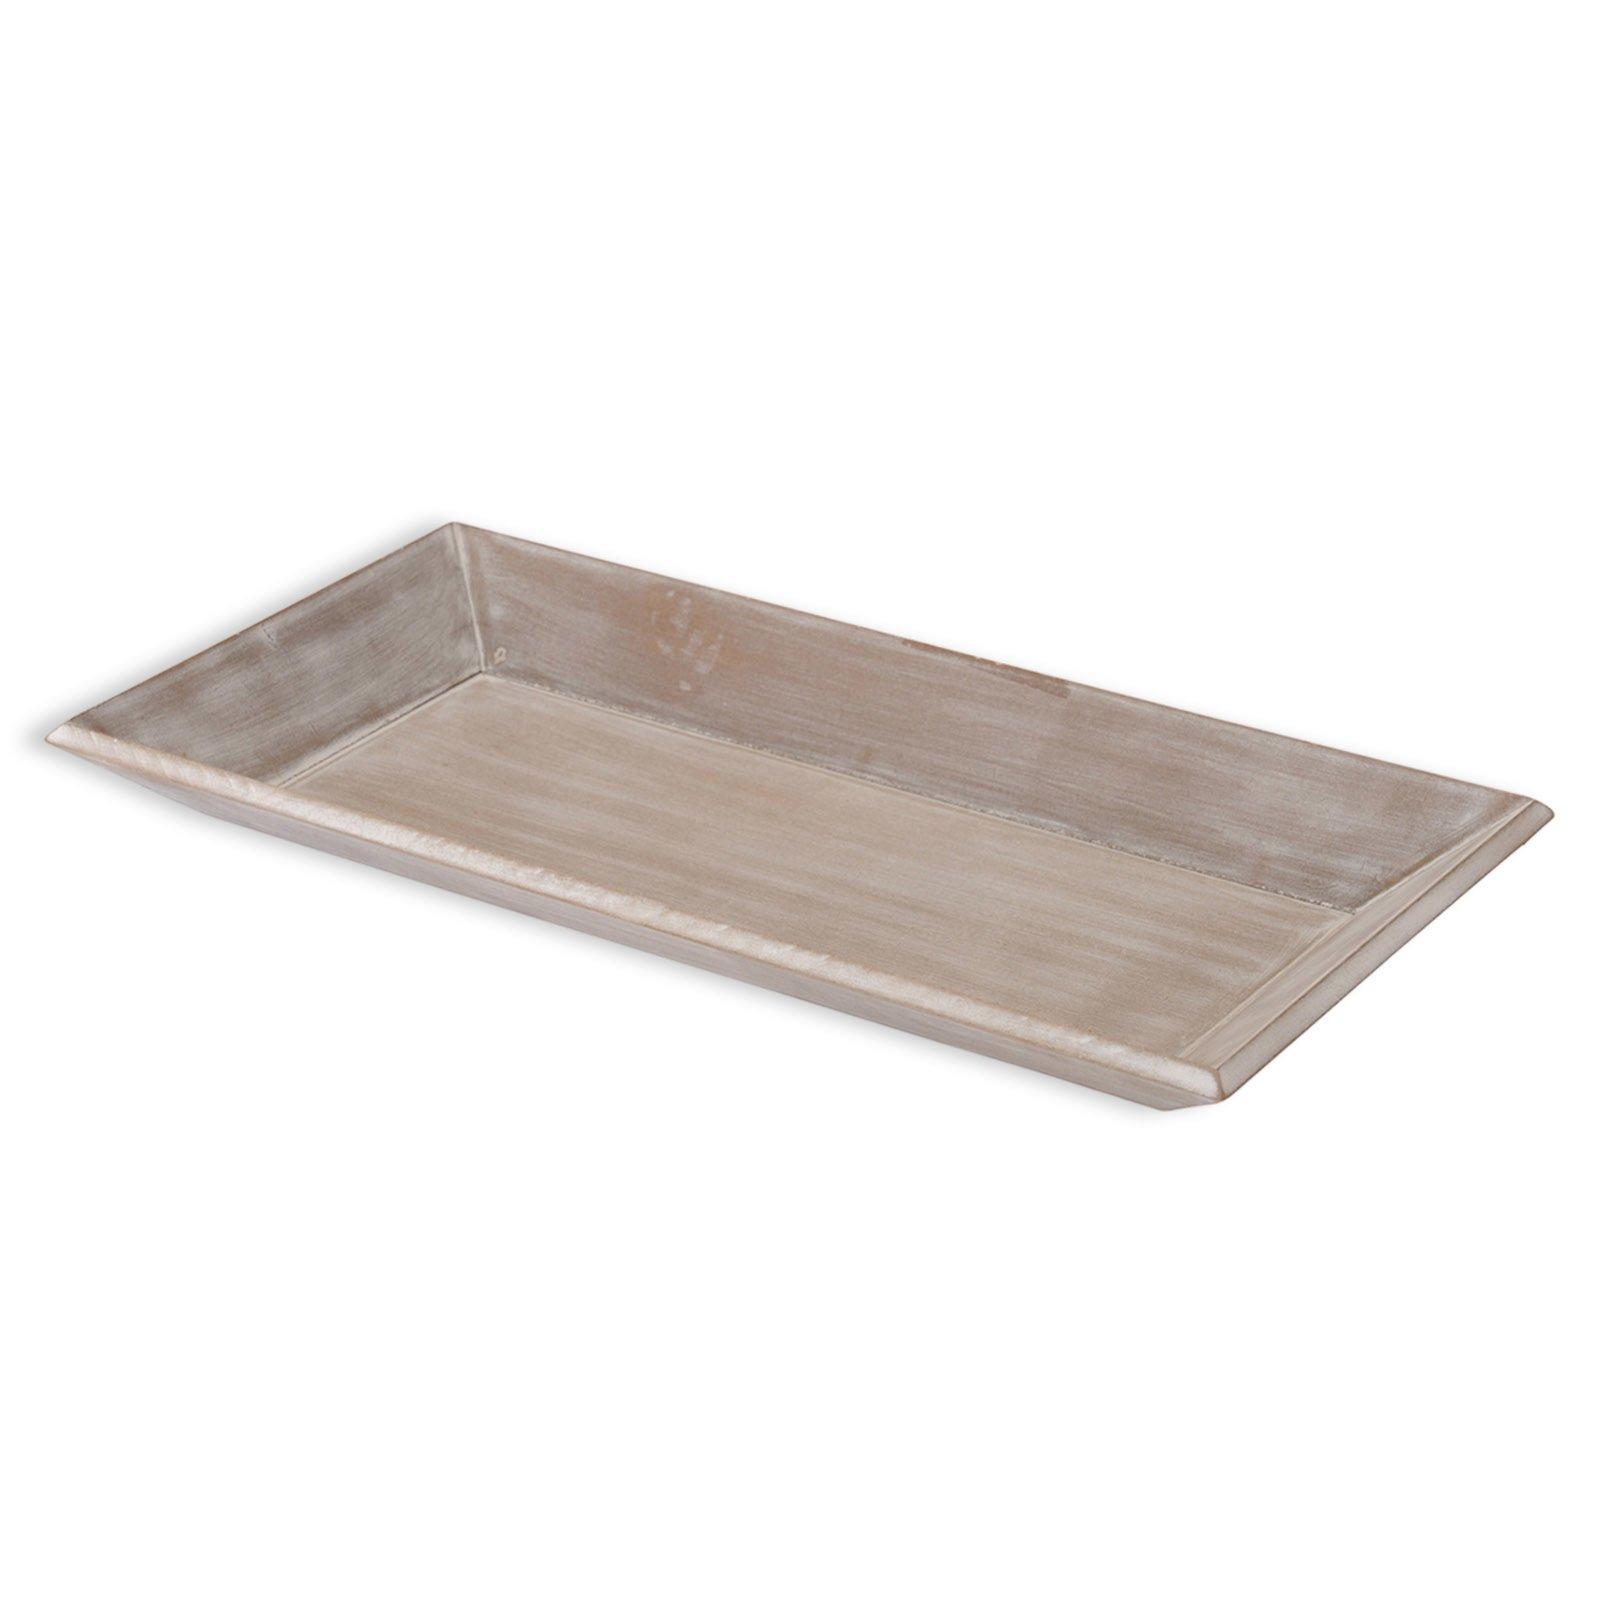 Deko-Teller - grau - Holz - länglich - 40x20 cm